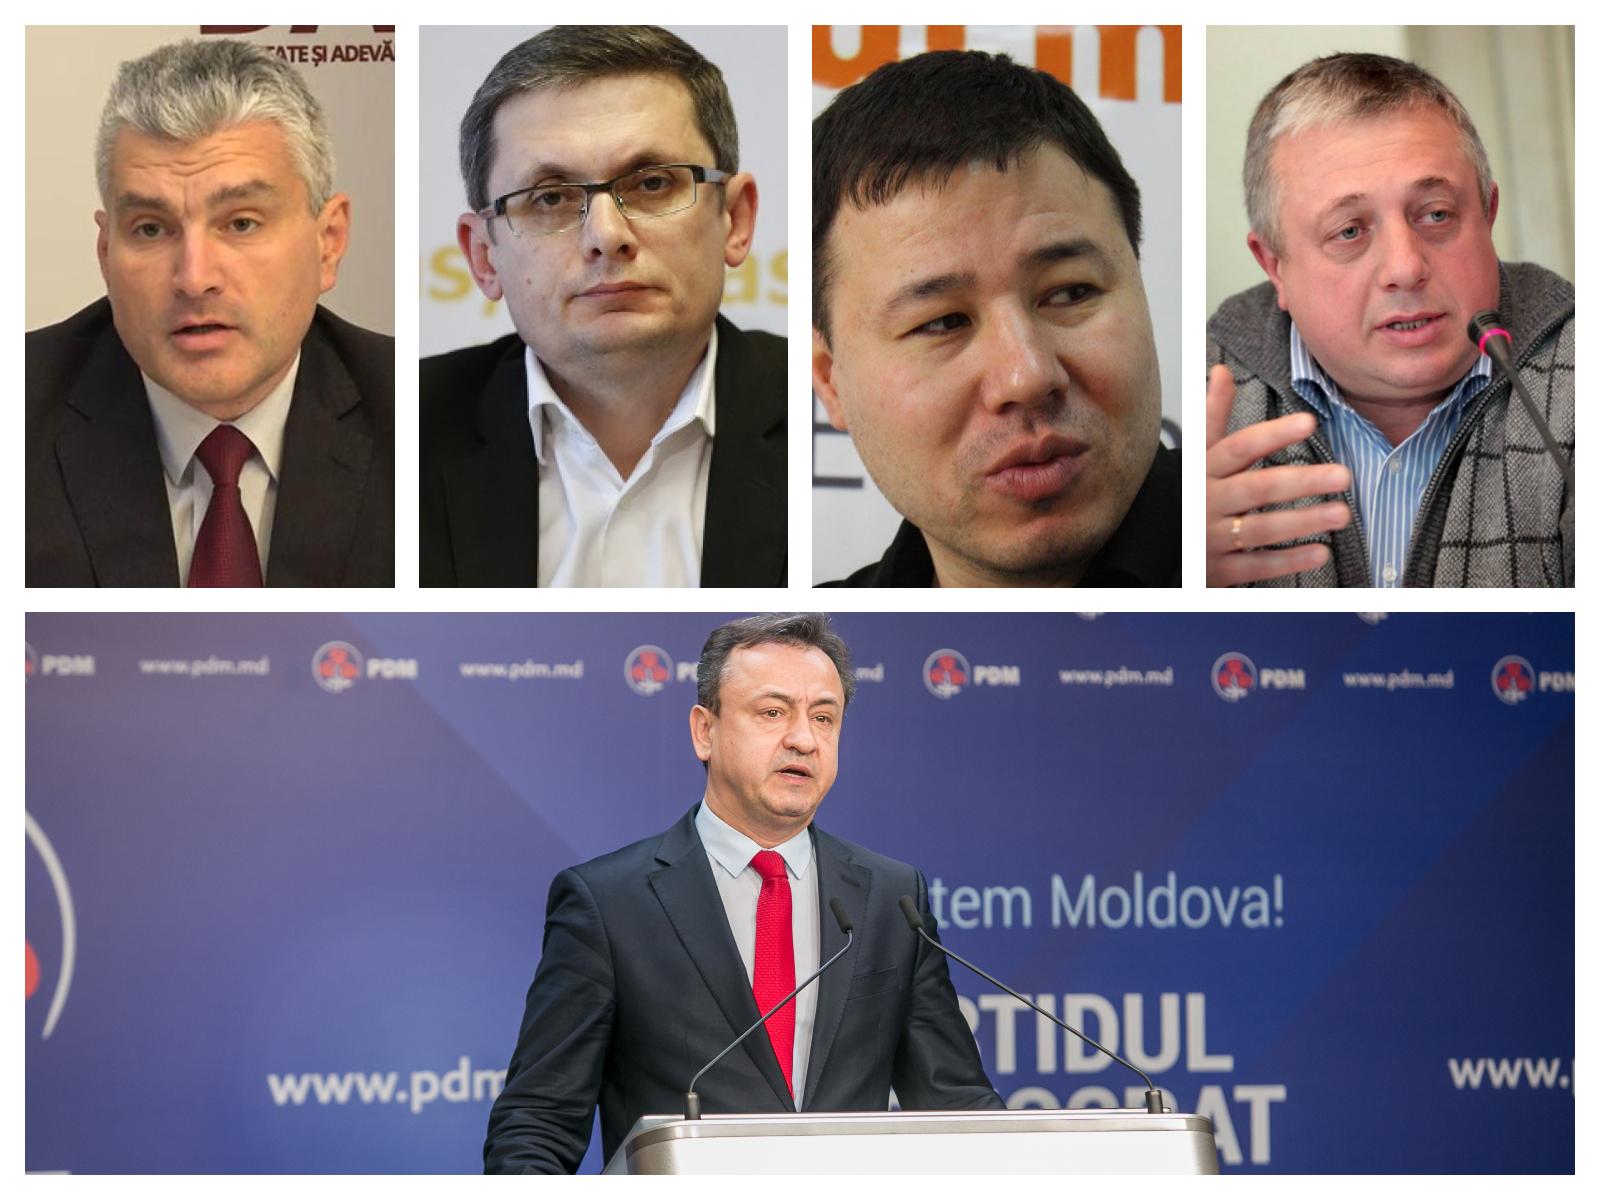 Codul PD, criticat dur de opoziție